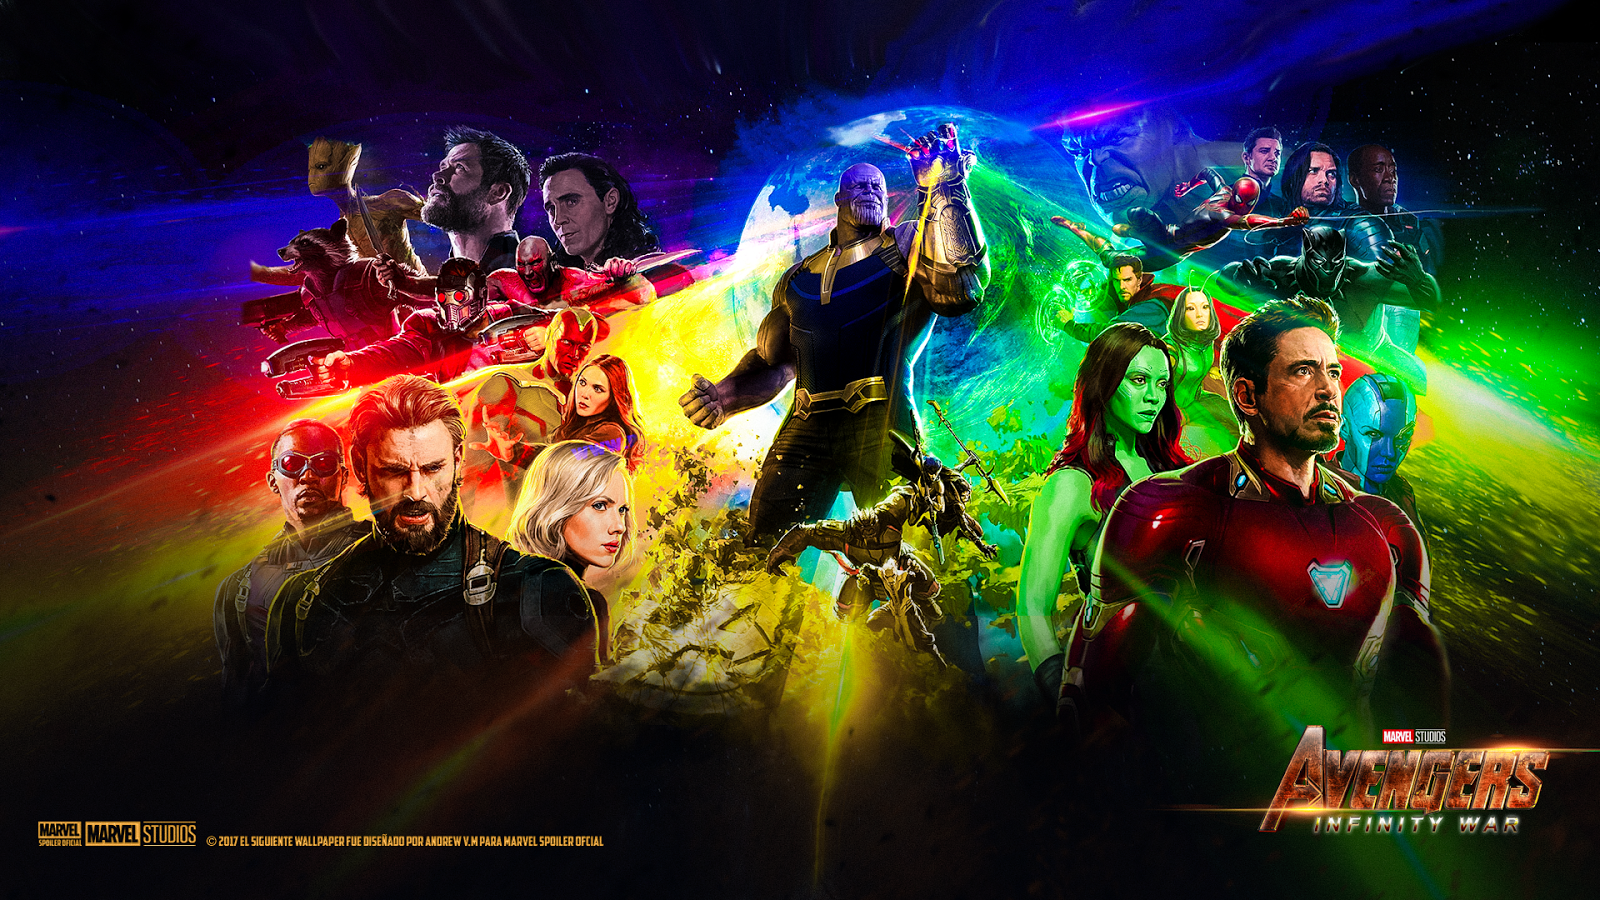 89 Avengers Infinity War Movie Wallpapers On Wallpapersafari